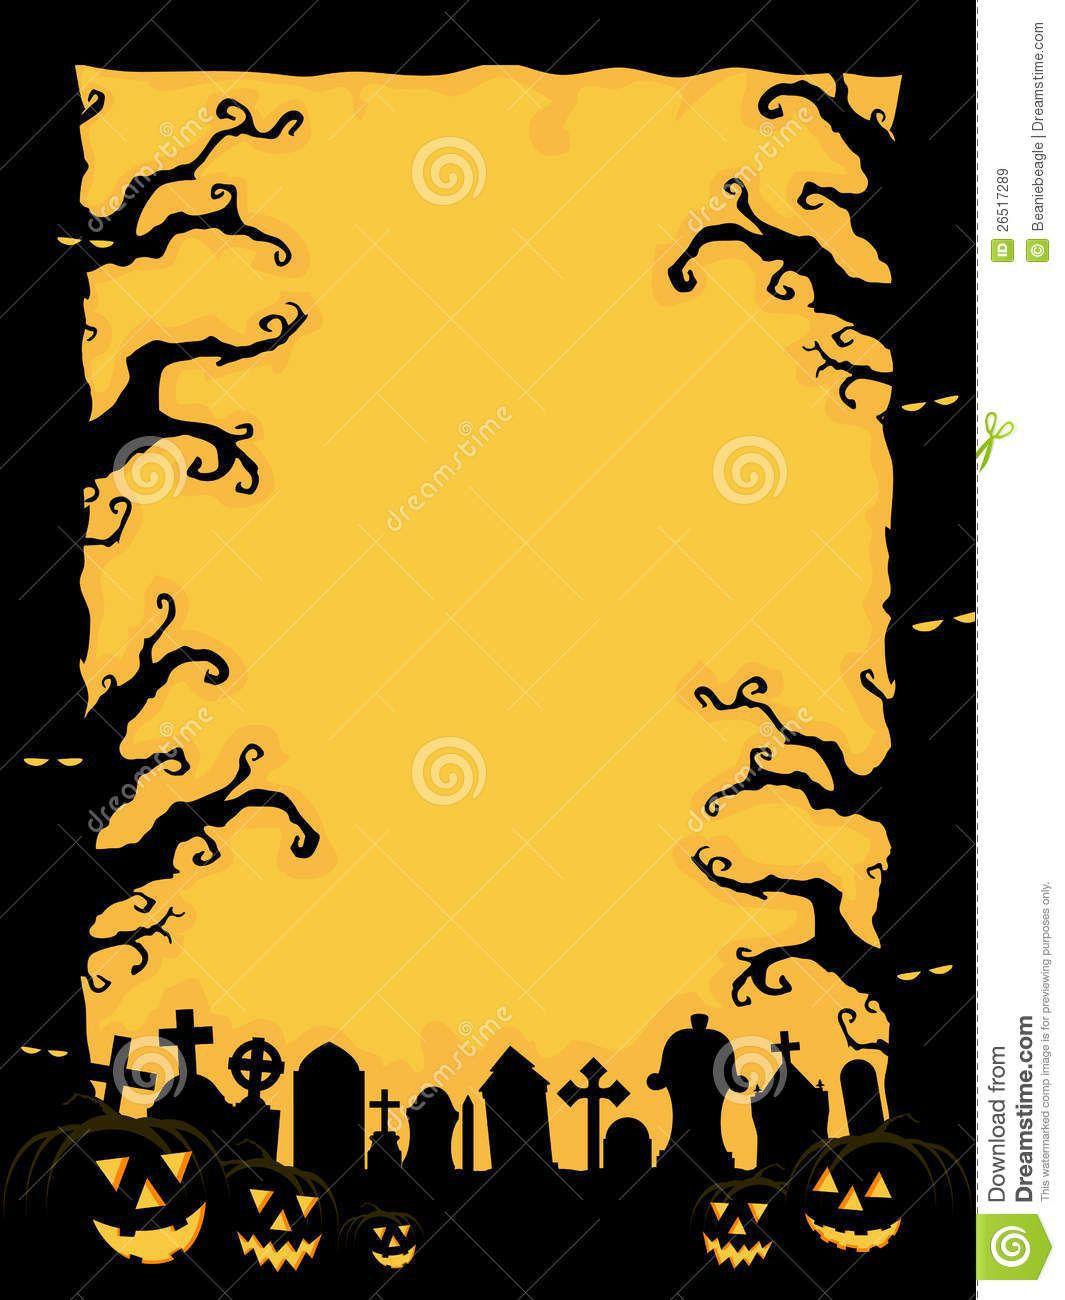 003 Striking Free Halloween Invitation Template Design  Templates Microsoft Word Wedding Printable PartyFull